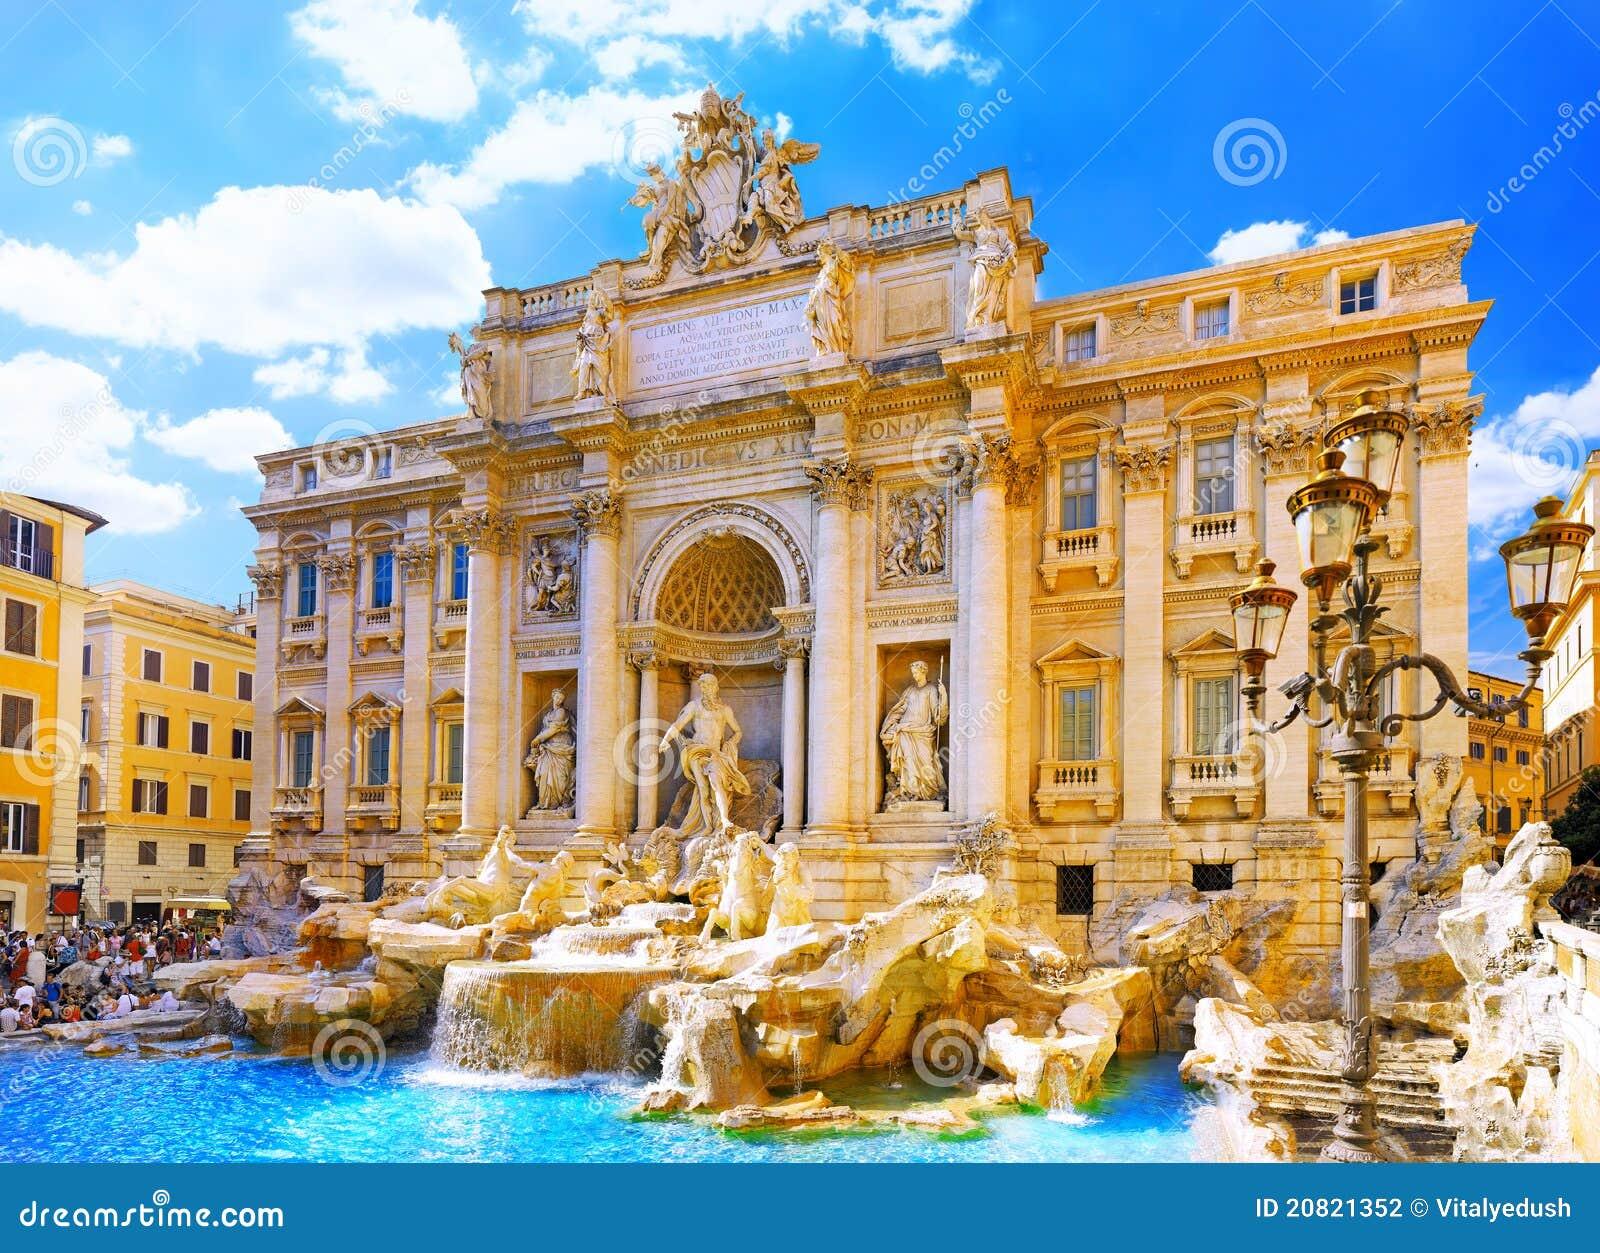 Fountain Di Trevi Rome Italy Stock Photography Image